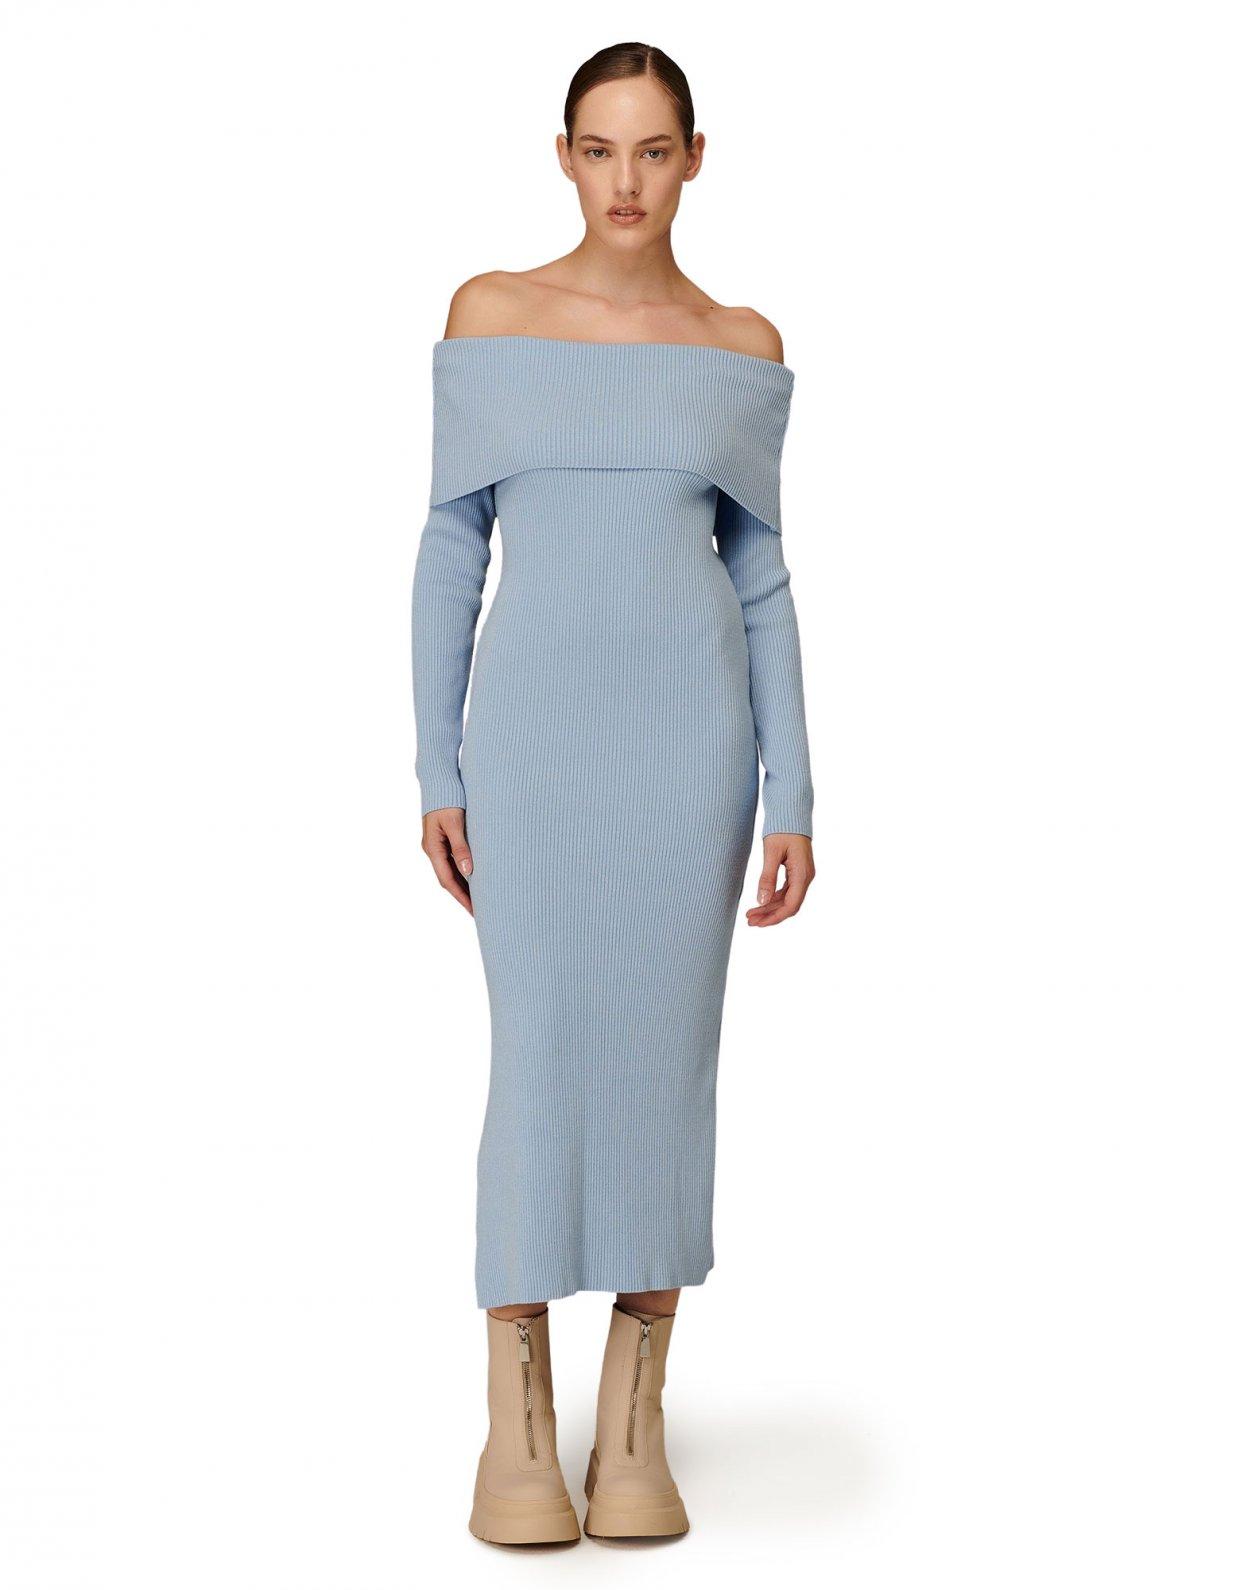 Combos Knitwear Combos W-105 Light blue dress